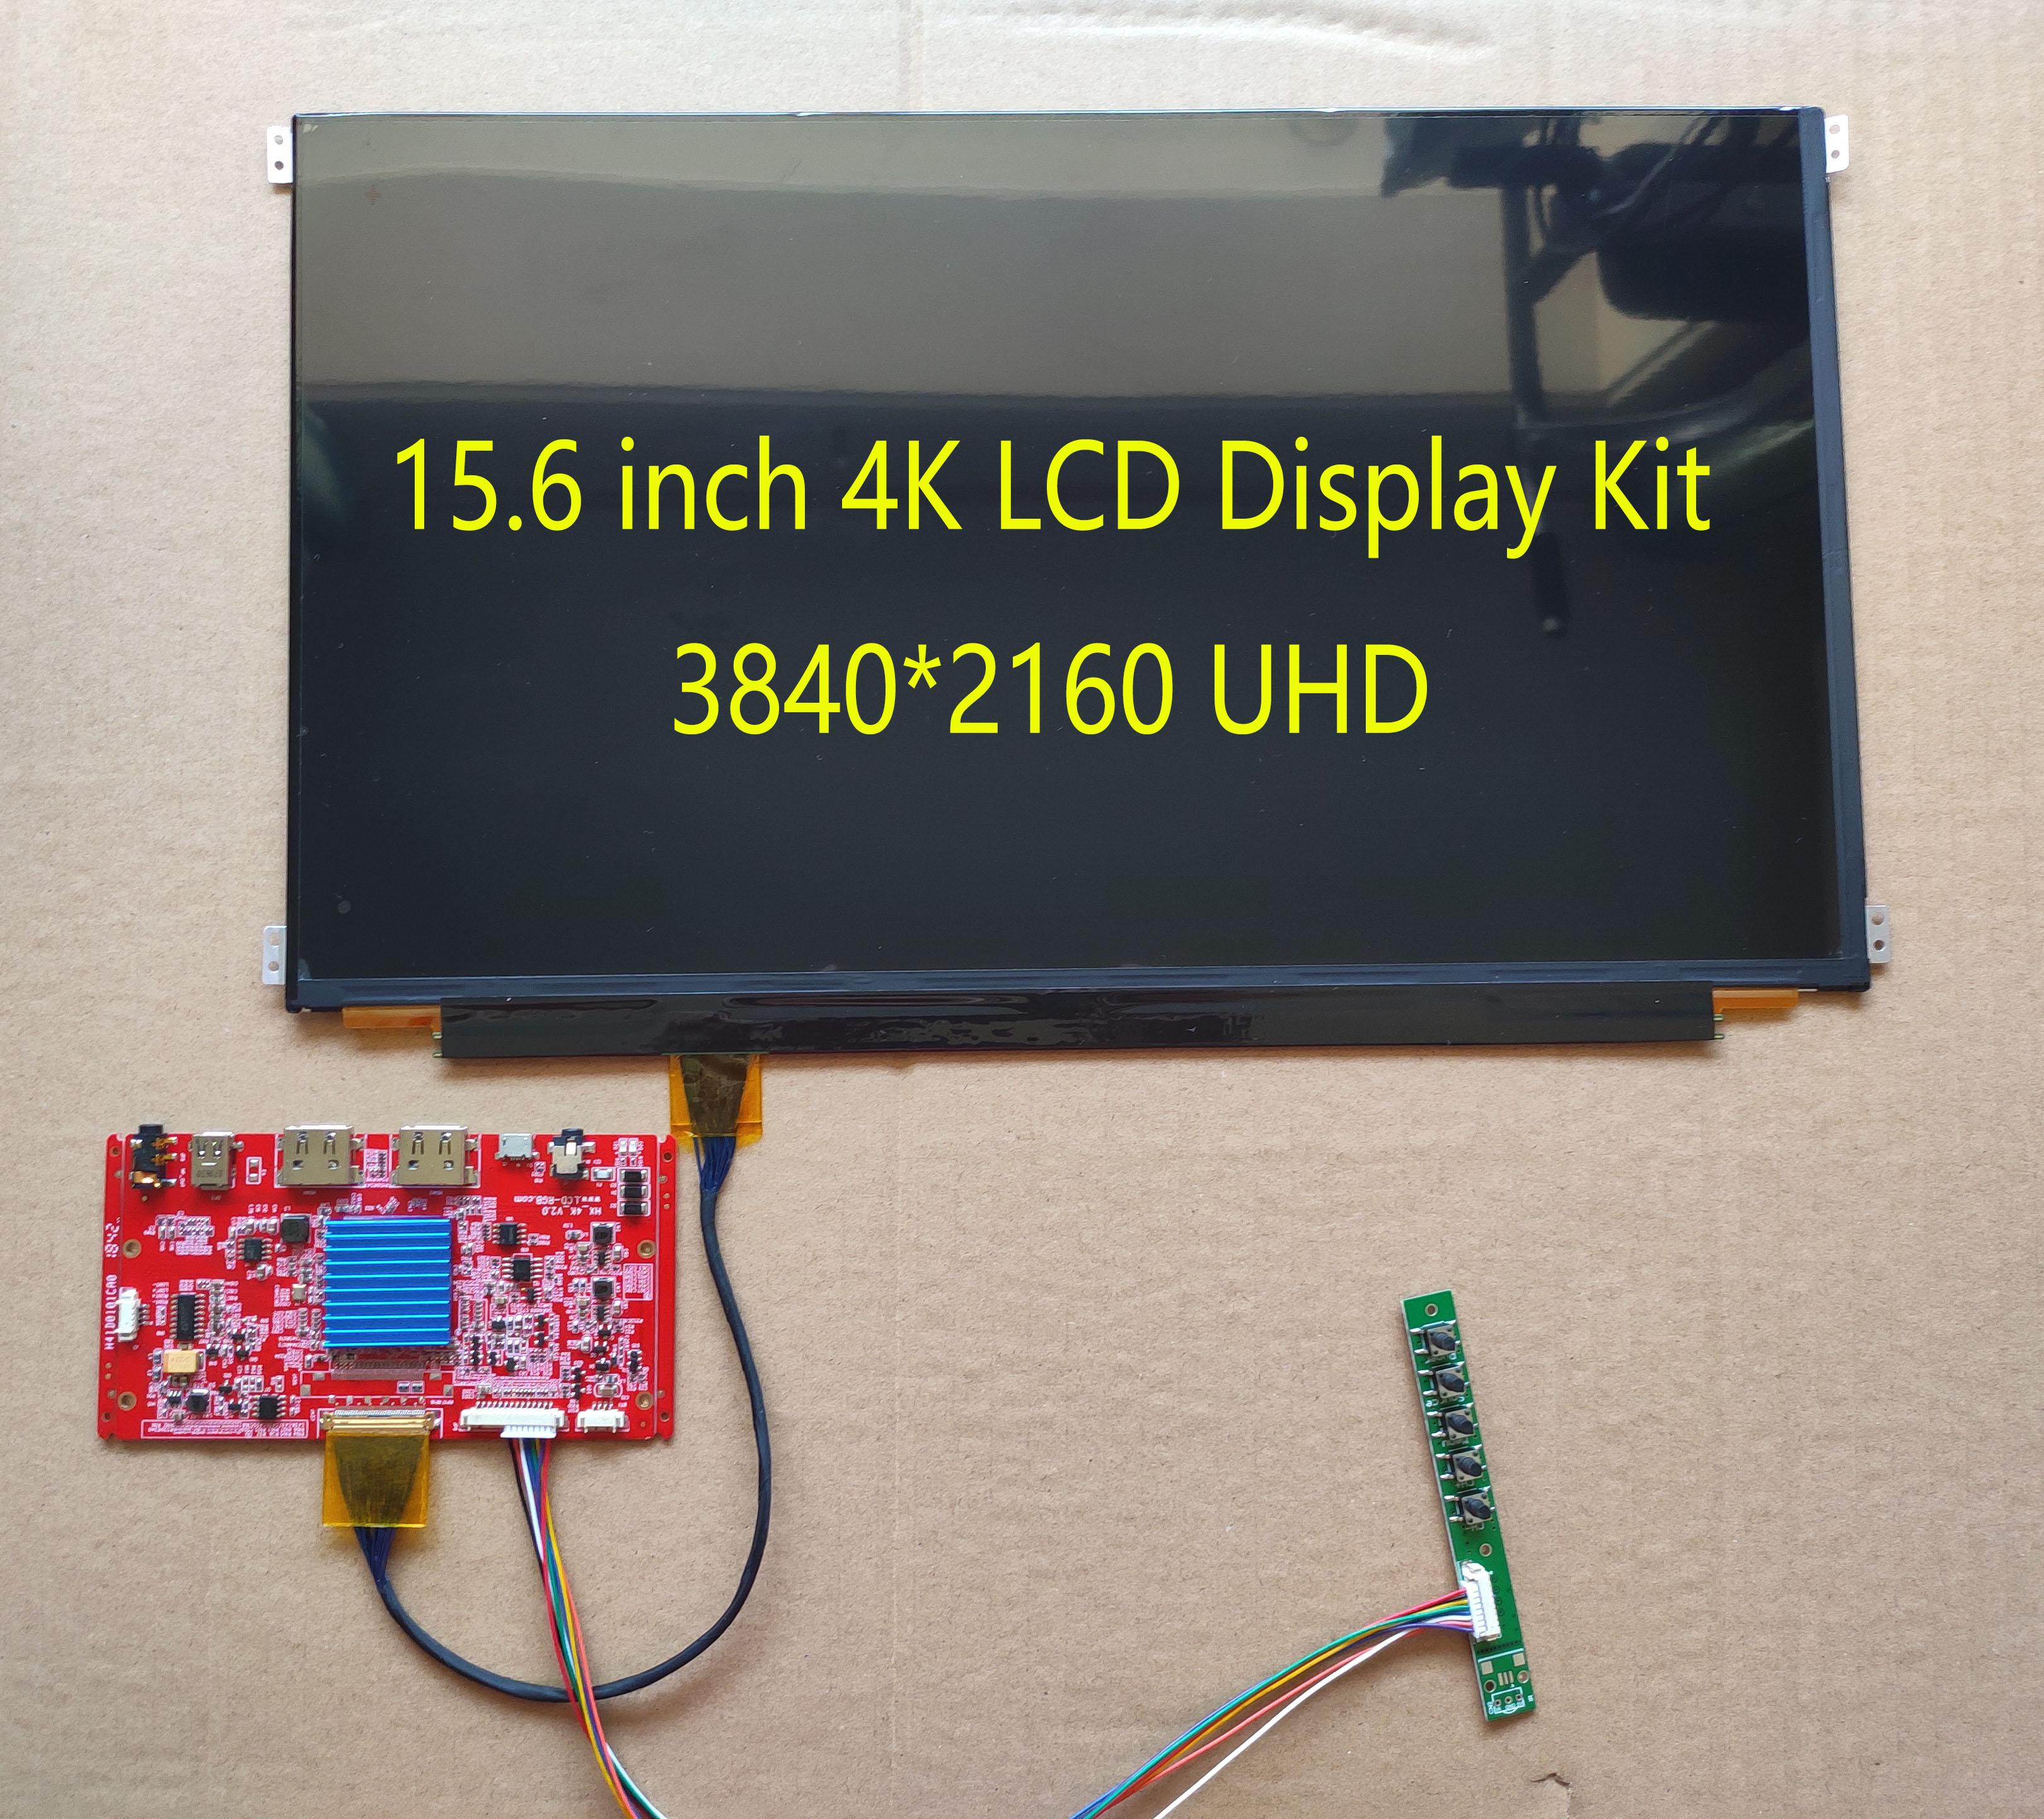 15.6inch LQ156DM1JW04 3840*2160 4K UHD HDMI Display Kit 10fingers Touch Screen